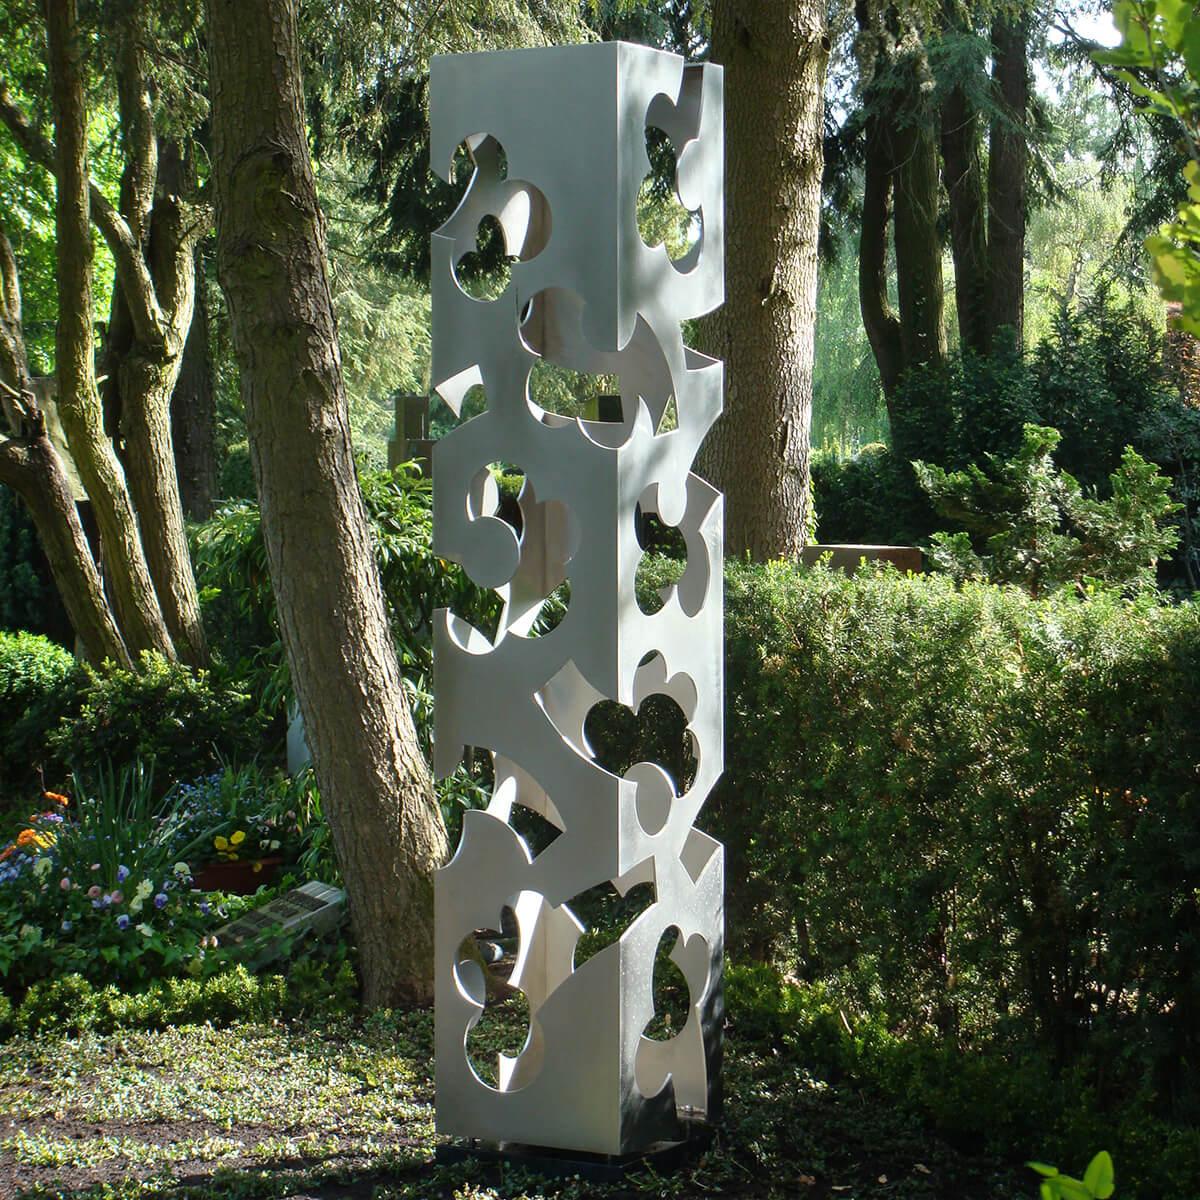 Barbara Jäger Malerei Skulptur Karlsruhe Blütenstele Hauptfriedhof Karlsruhe